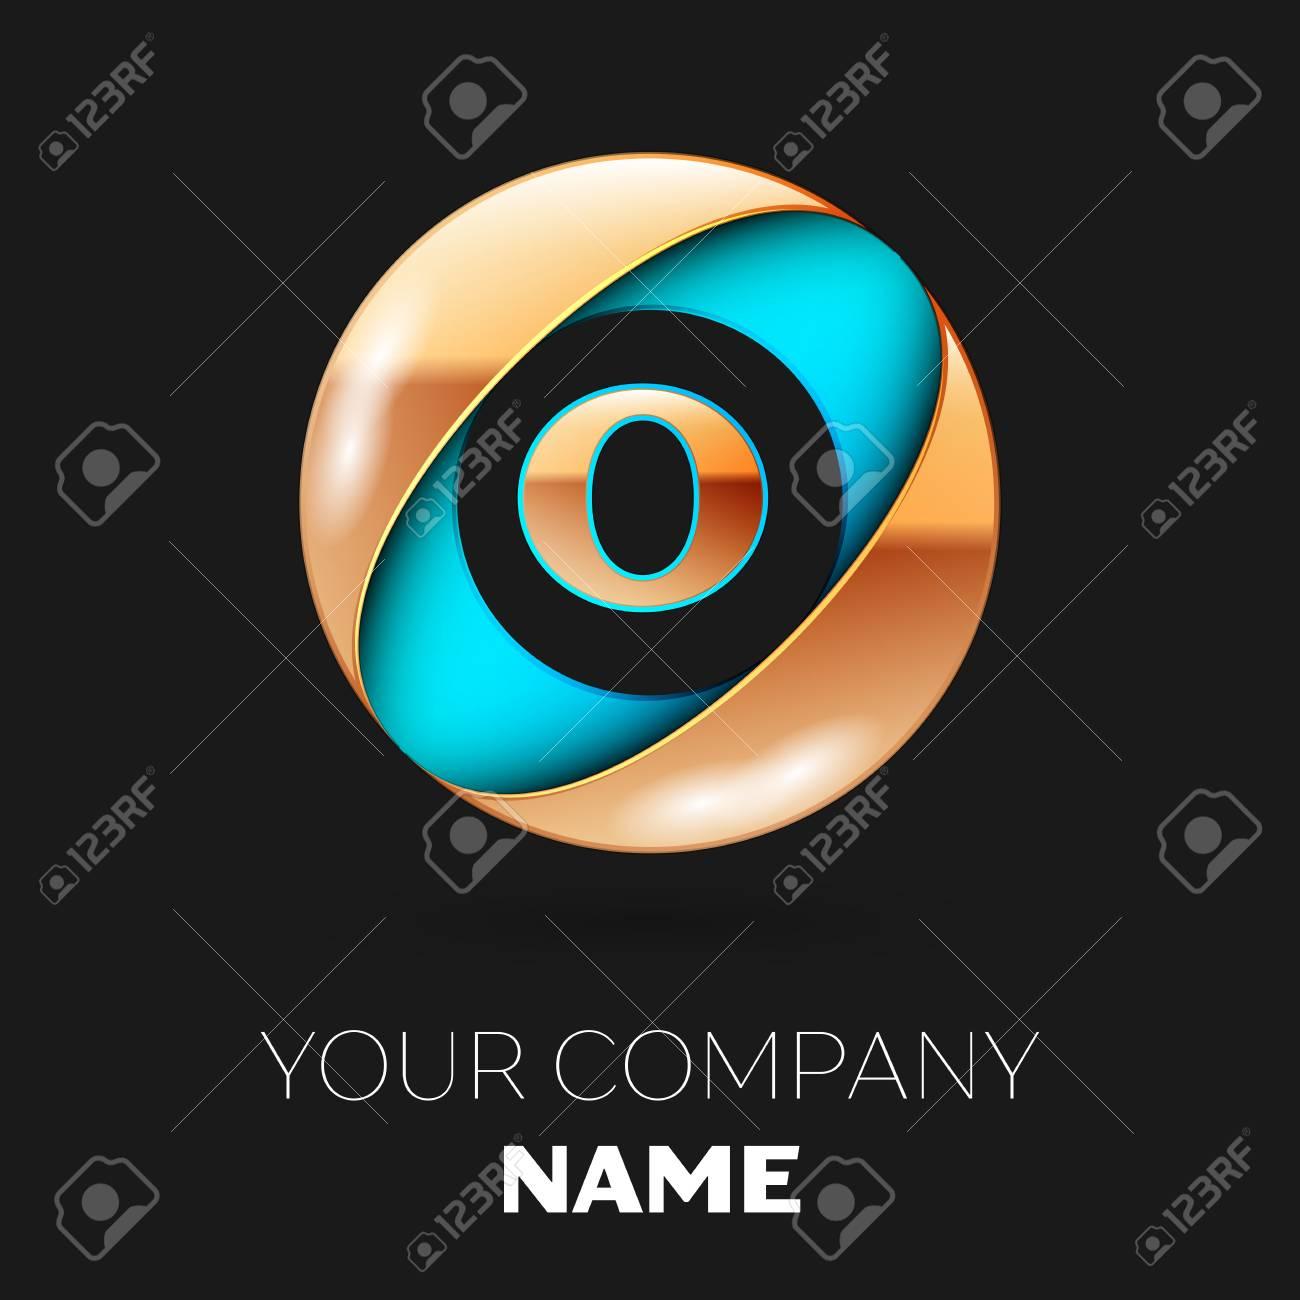 Realistic Golden Letter O Logo Symbol In The Blue Golden Colorful